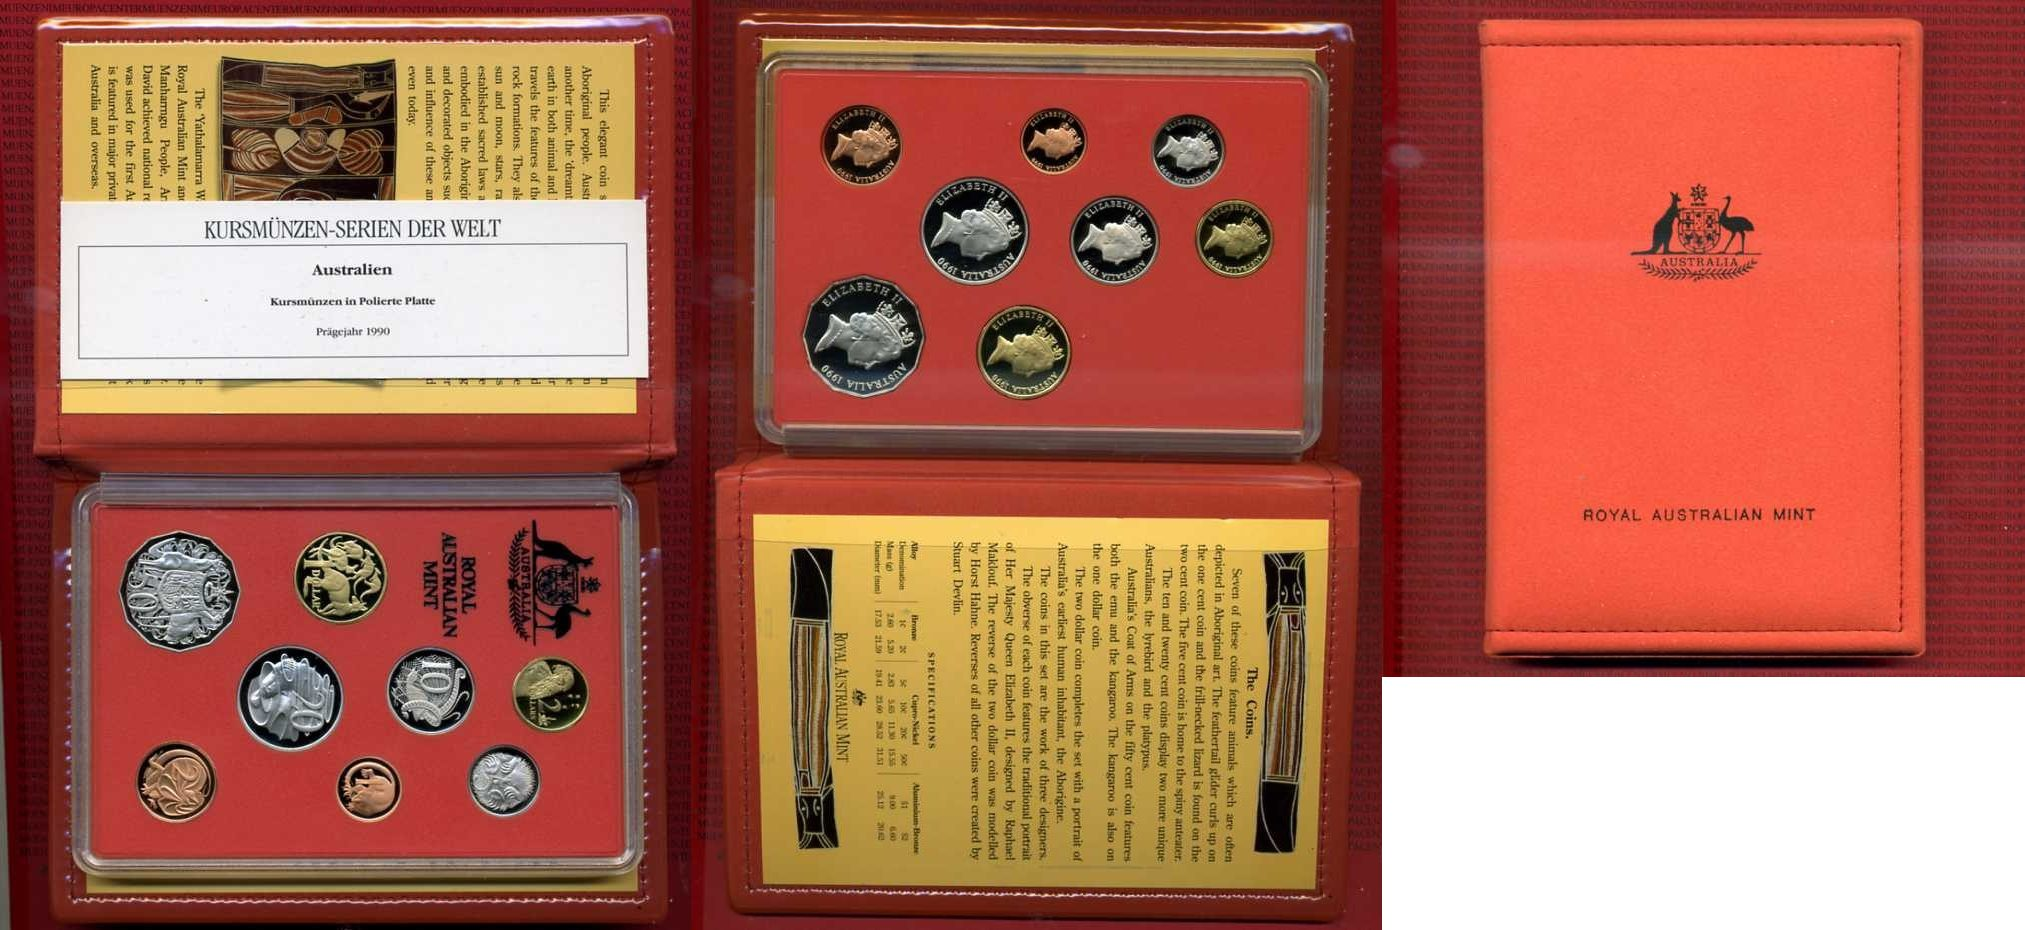 1 Cent-1 Dollar Kursmünzensatz 1990 Australien Australien Kursmünzen 1 Cent-1 Dollar 1990 Polierte Platte im Folder